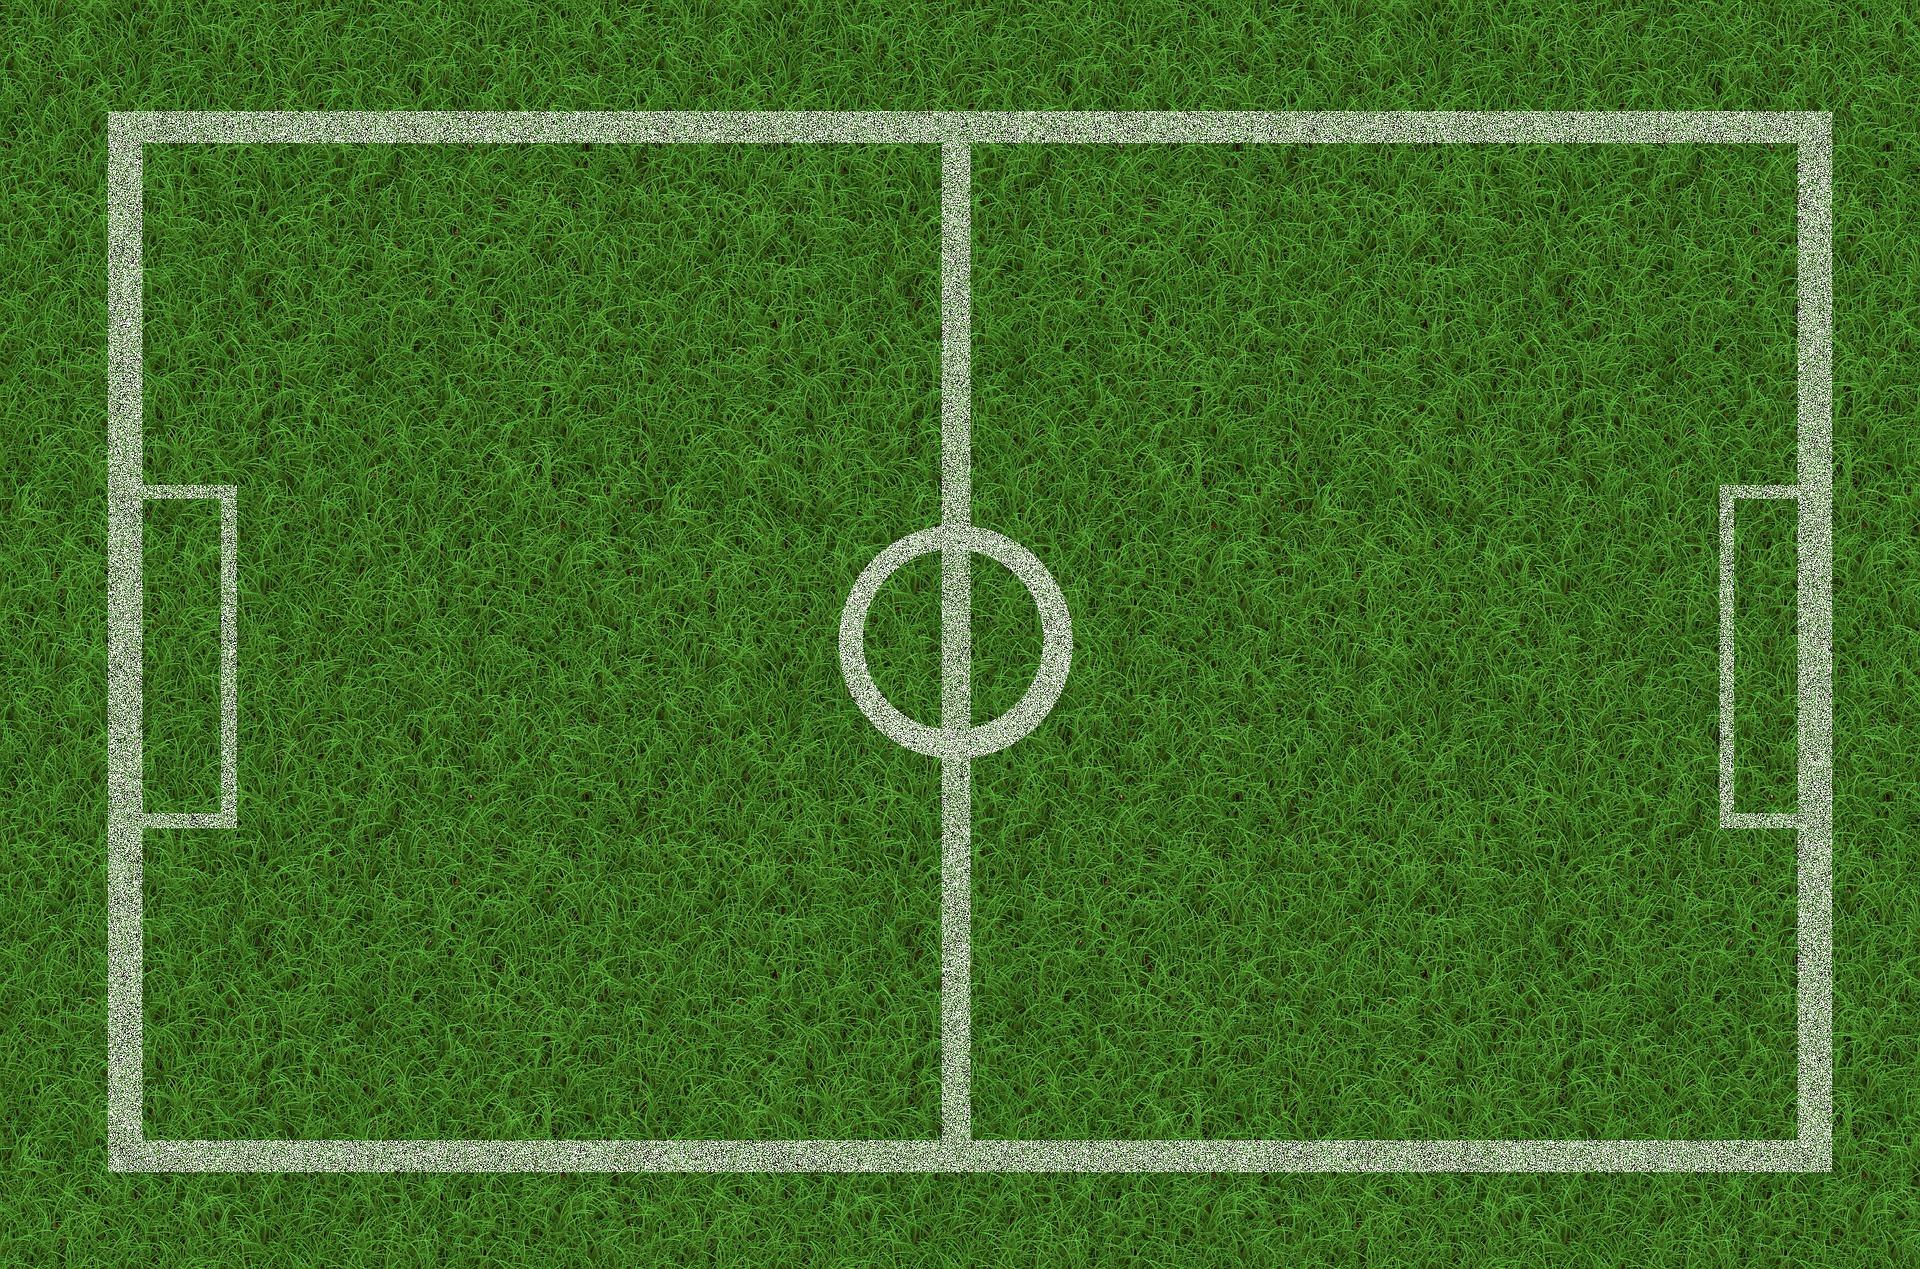 Projet Football